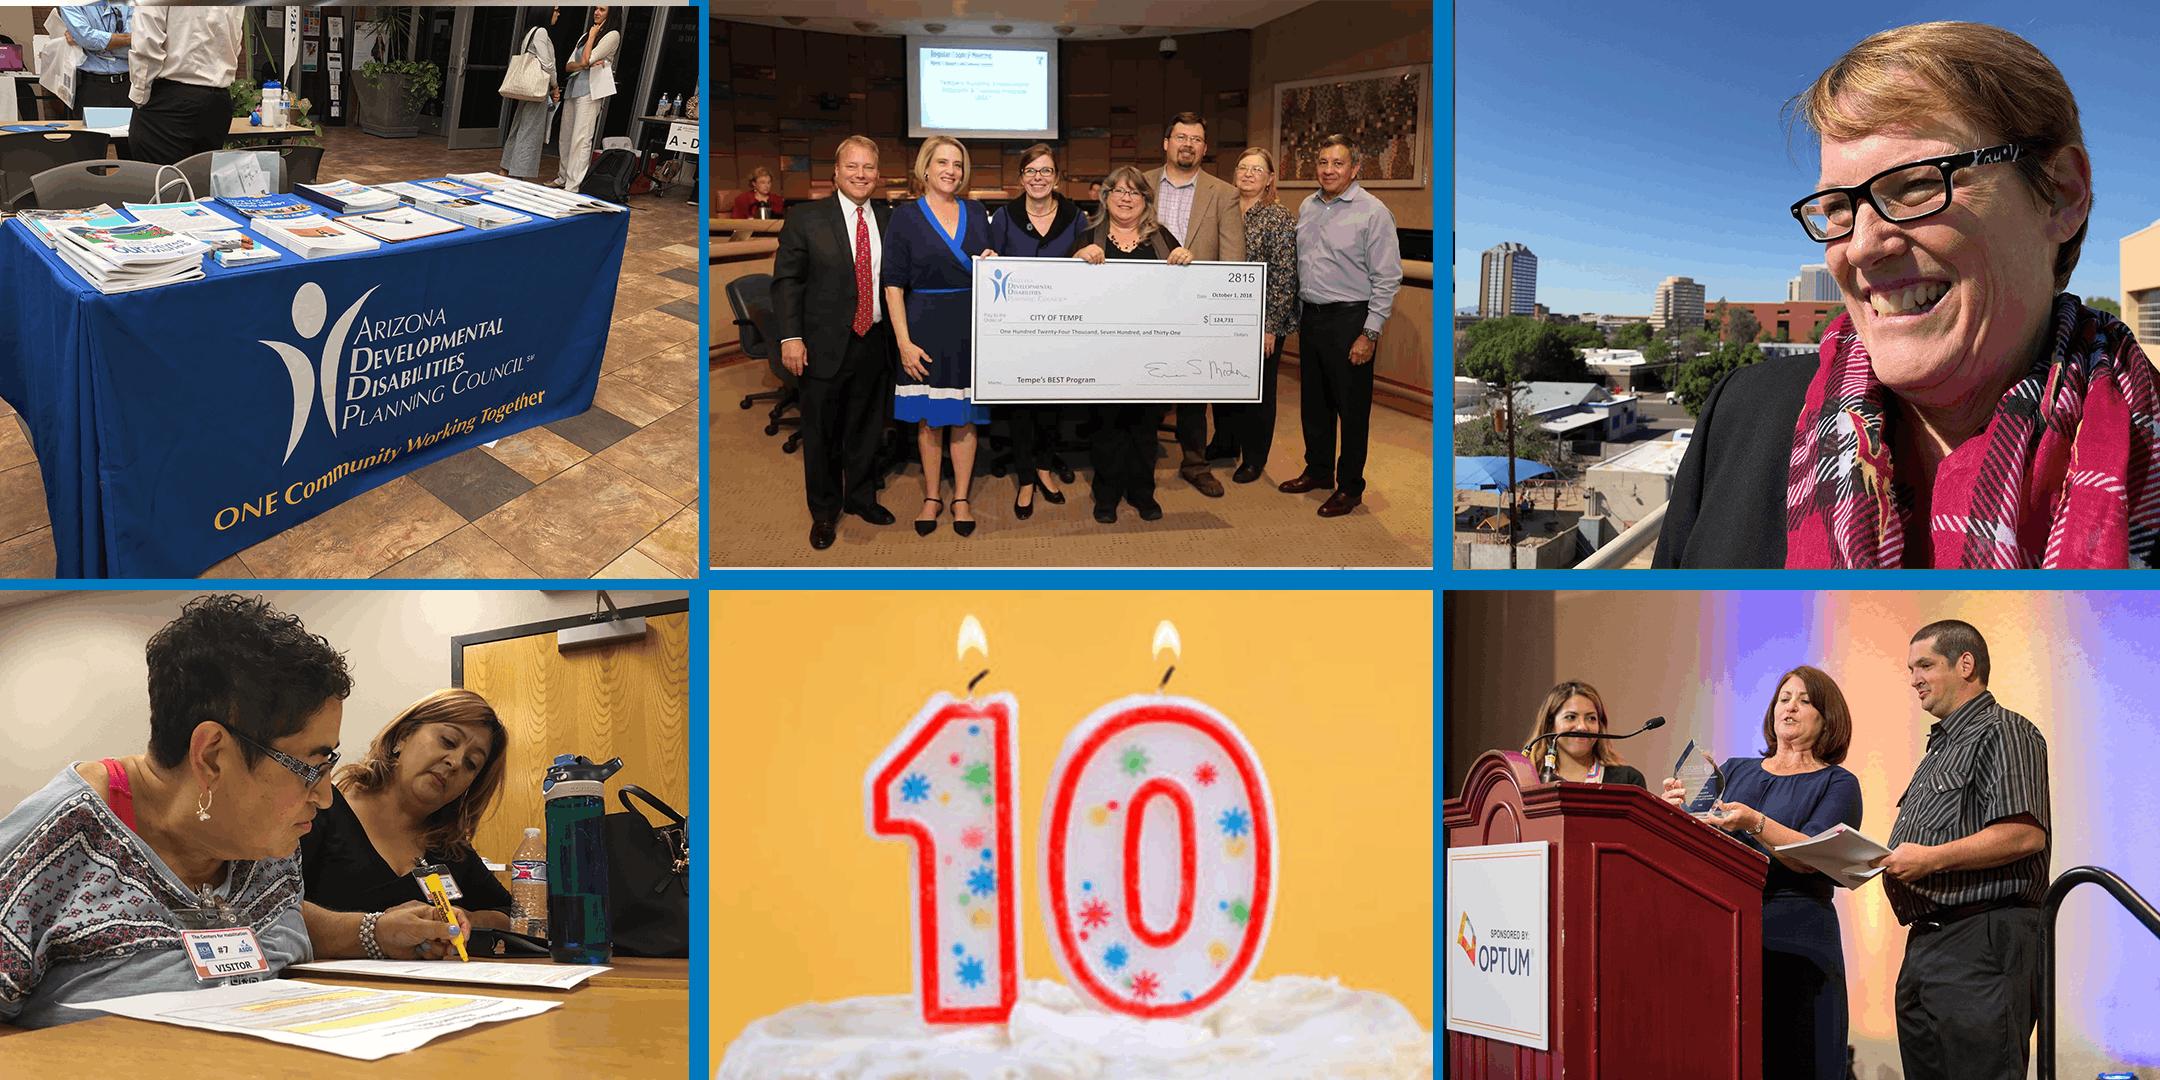 Arizona Developmental Disabilities Planning Council 10-Year Anniversary